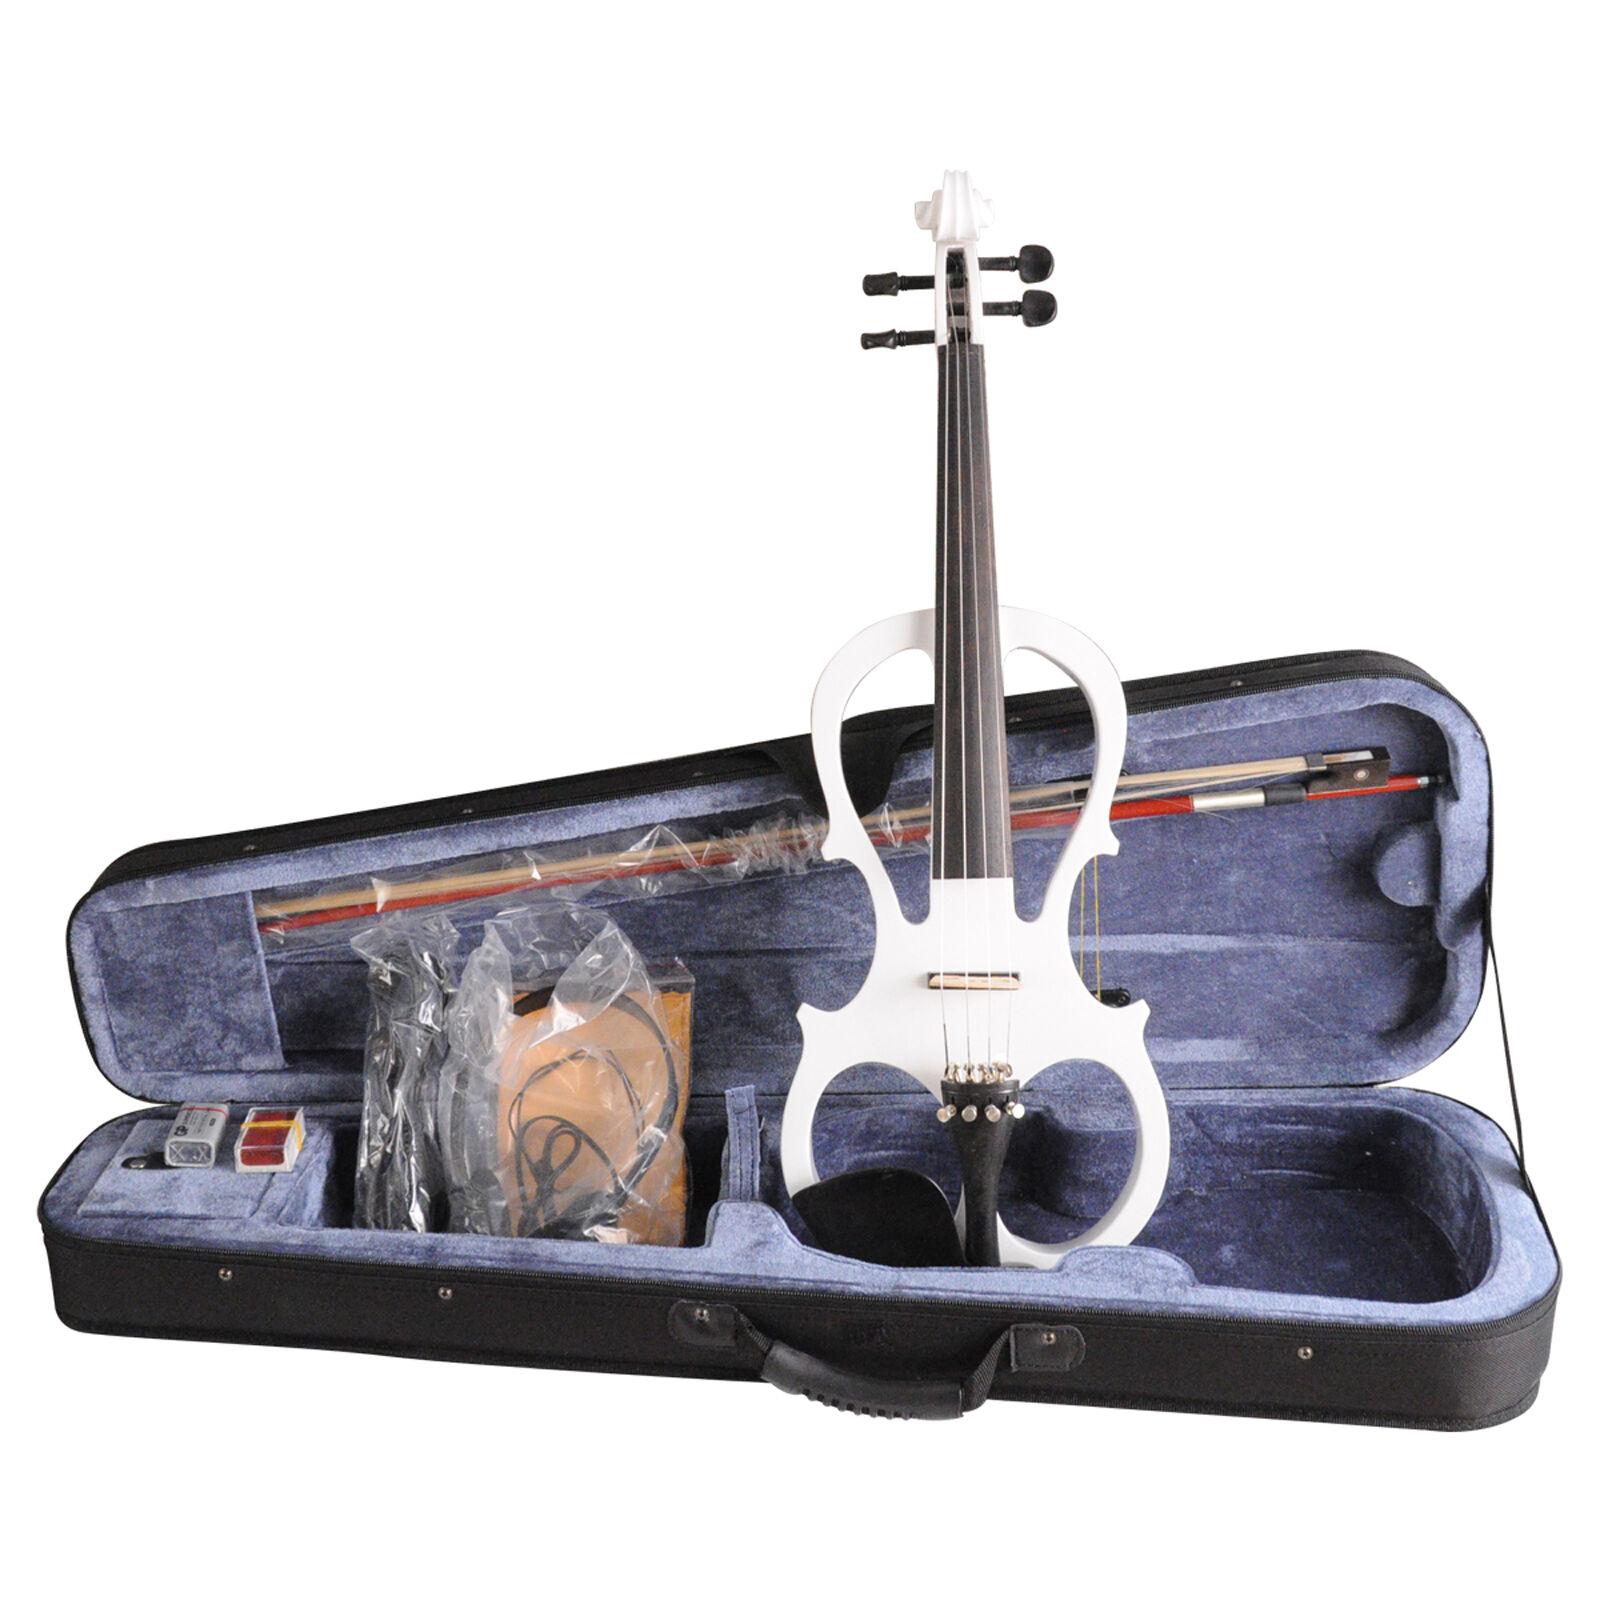 4 4 violín eléctrico blancoo estilo VE008B Espuma Espuma Espuma Estuche Arco Resina De Auriculares 85c016